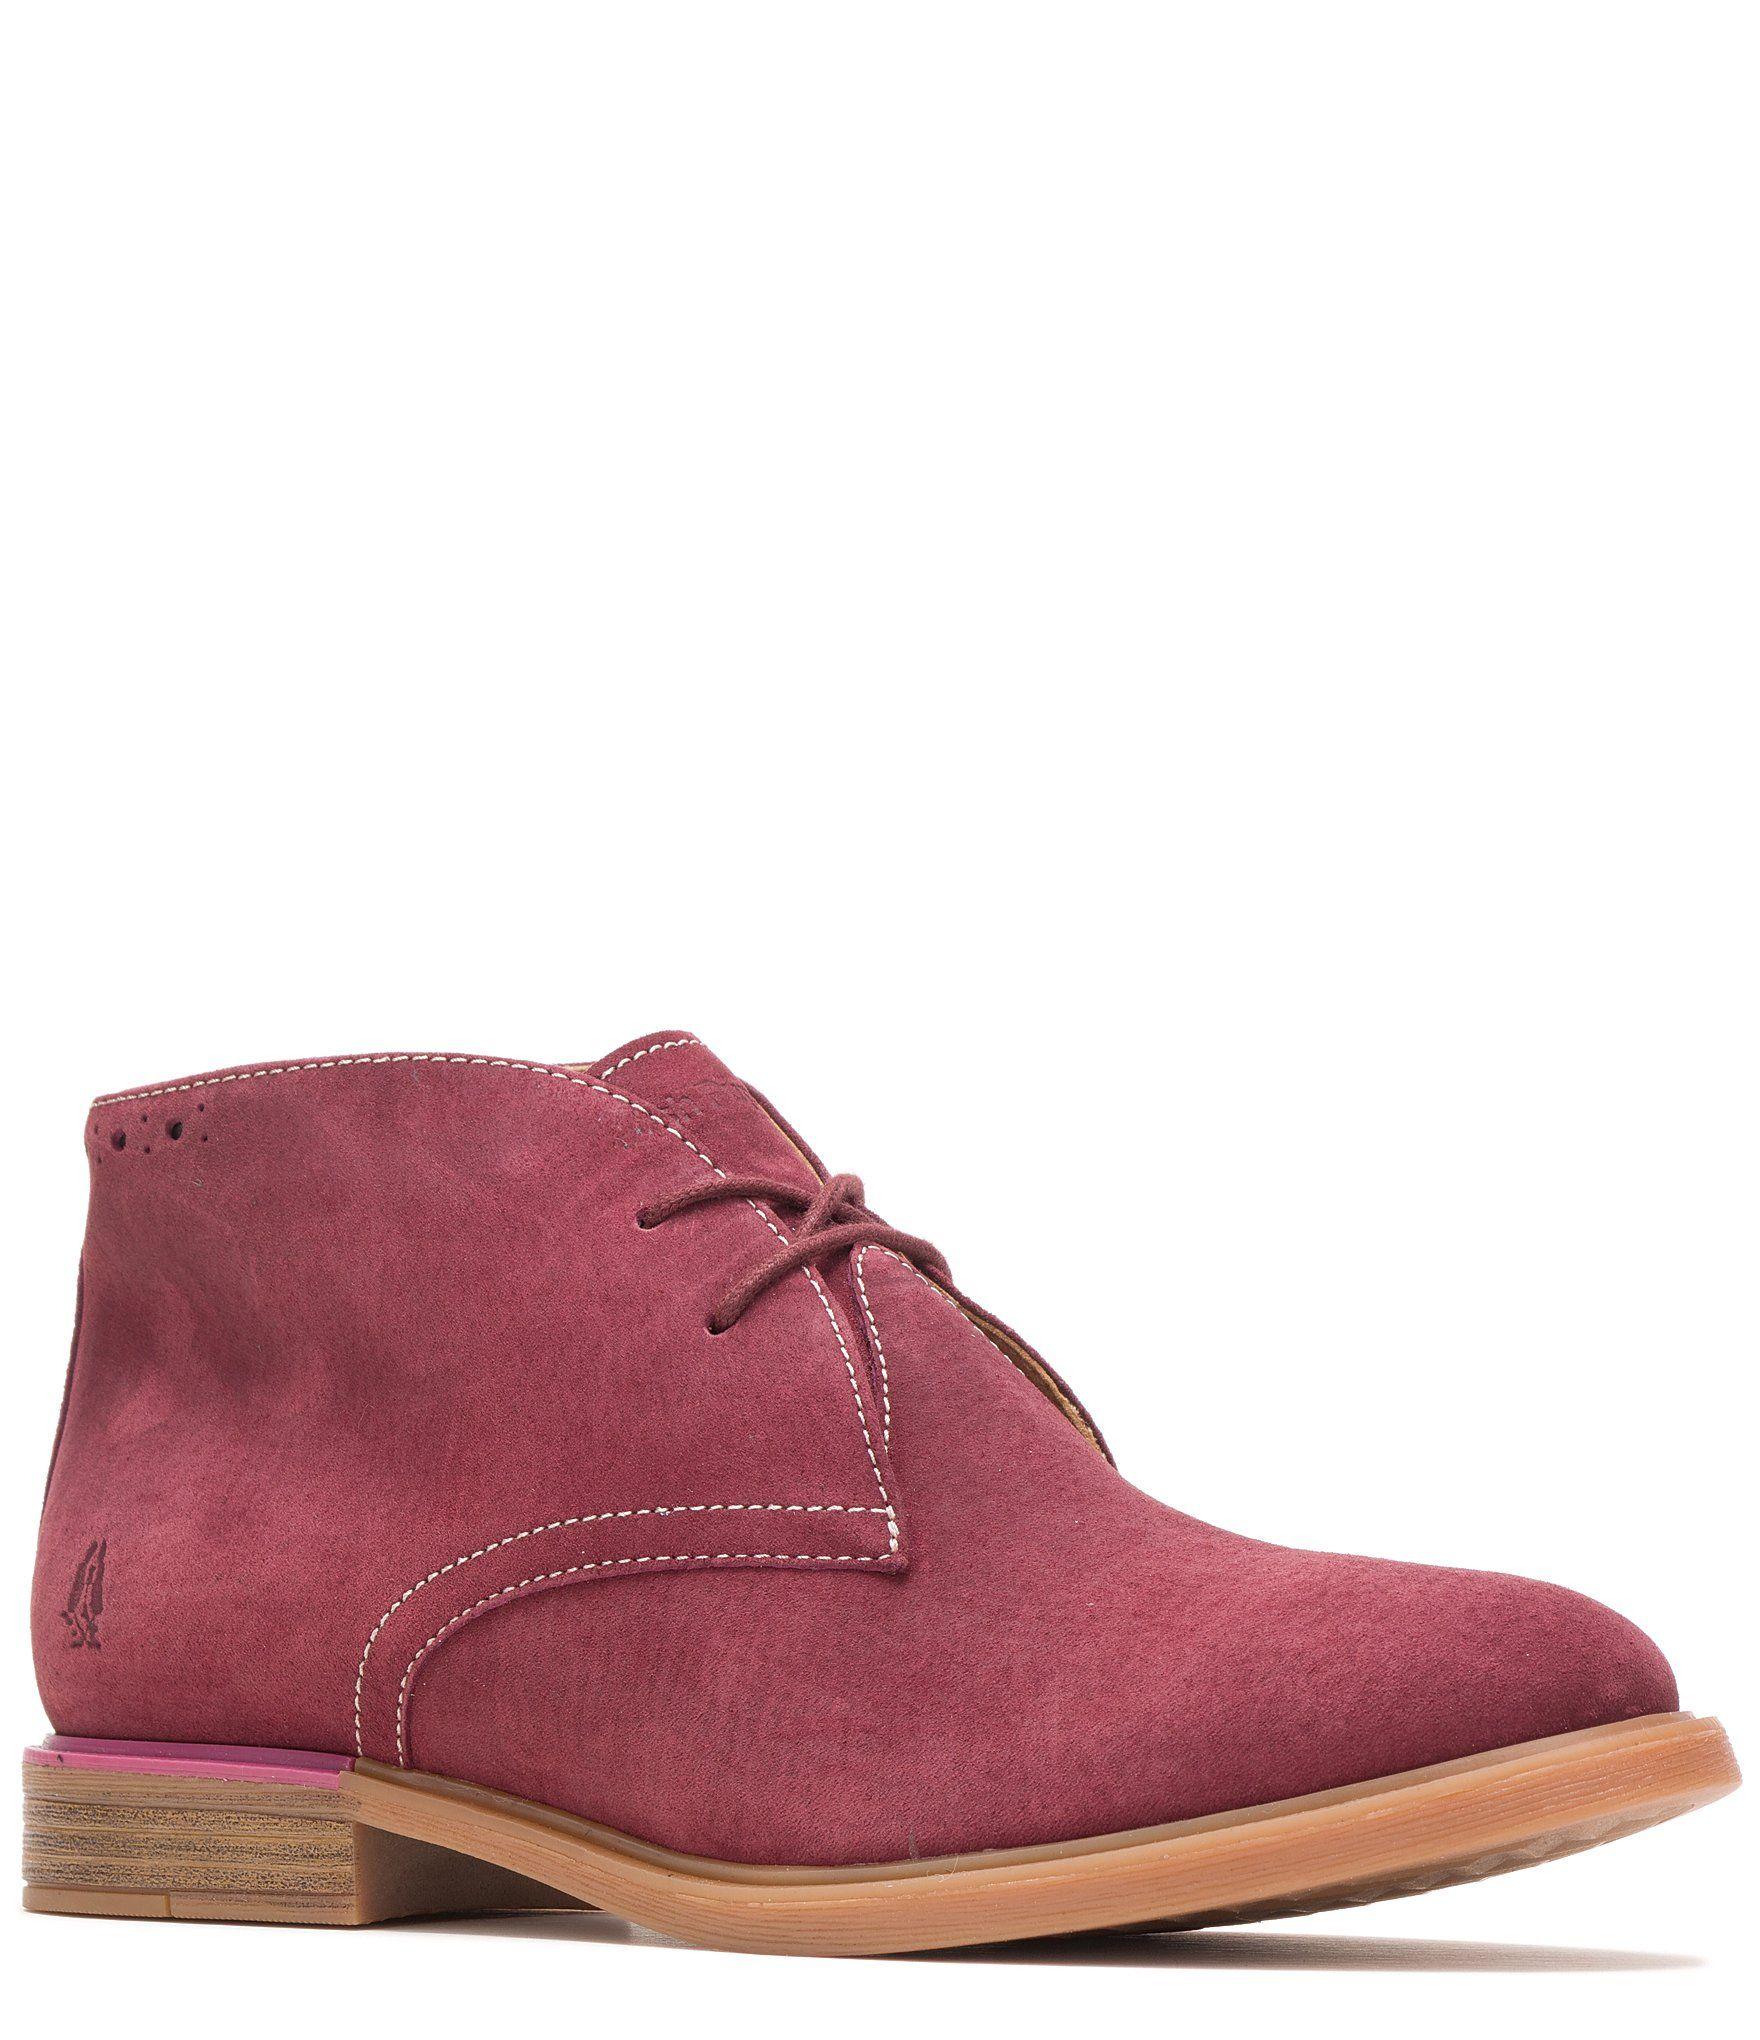 Hush Puppies Bailey Chukka Suede Block Heel Boots Cordovan Suede 7w Block Heel Boots Heeled Boots Boots